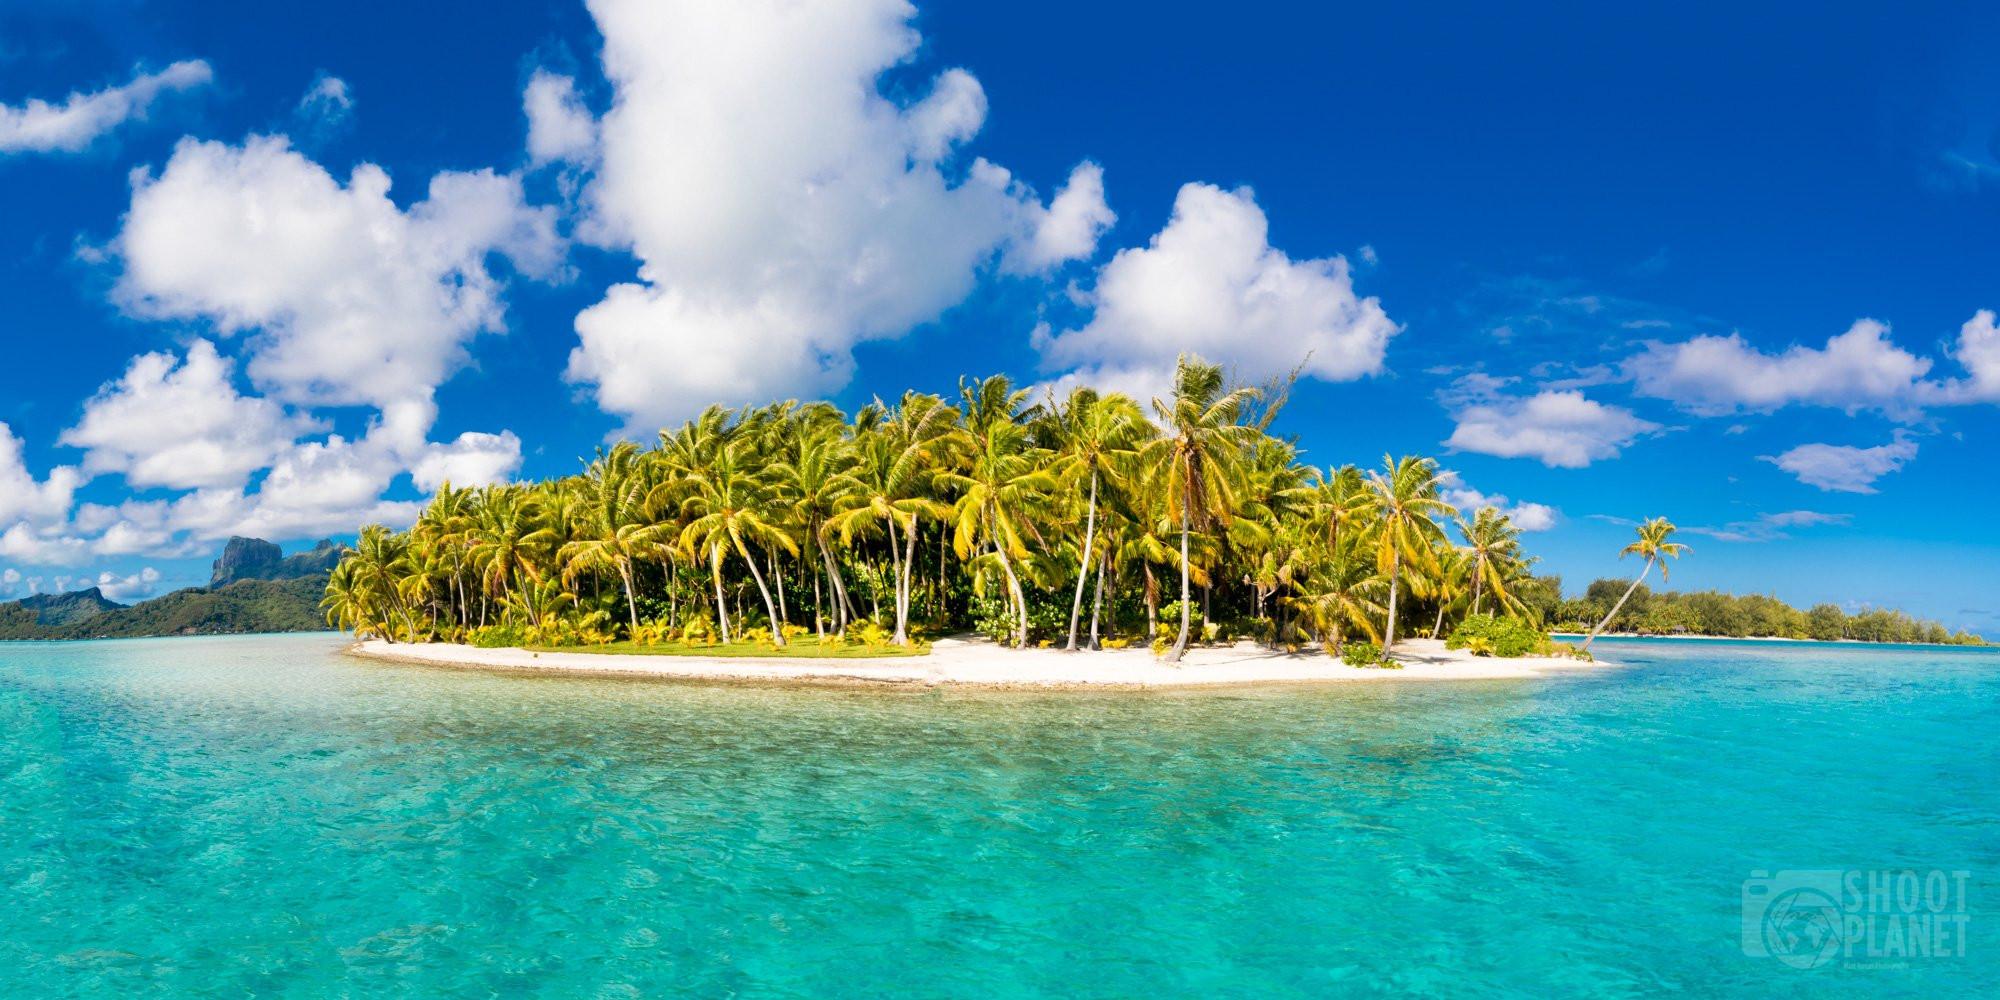 Motu Tane on Bora Bora island